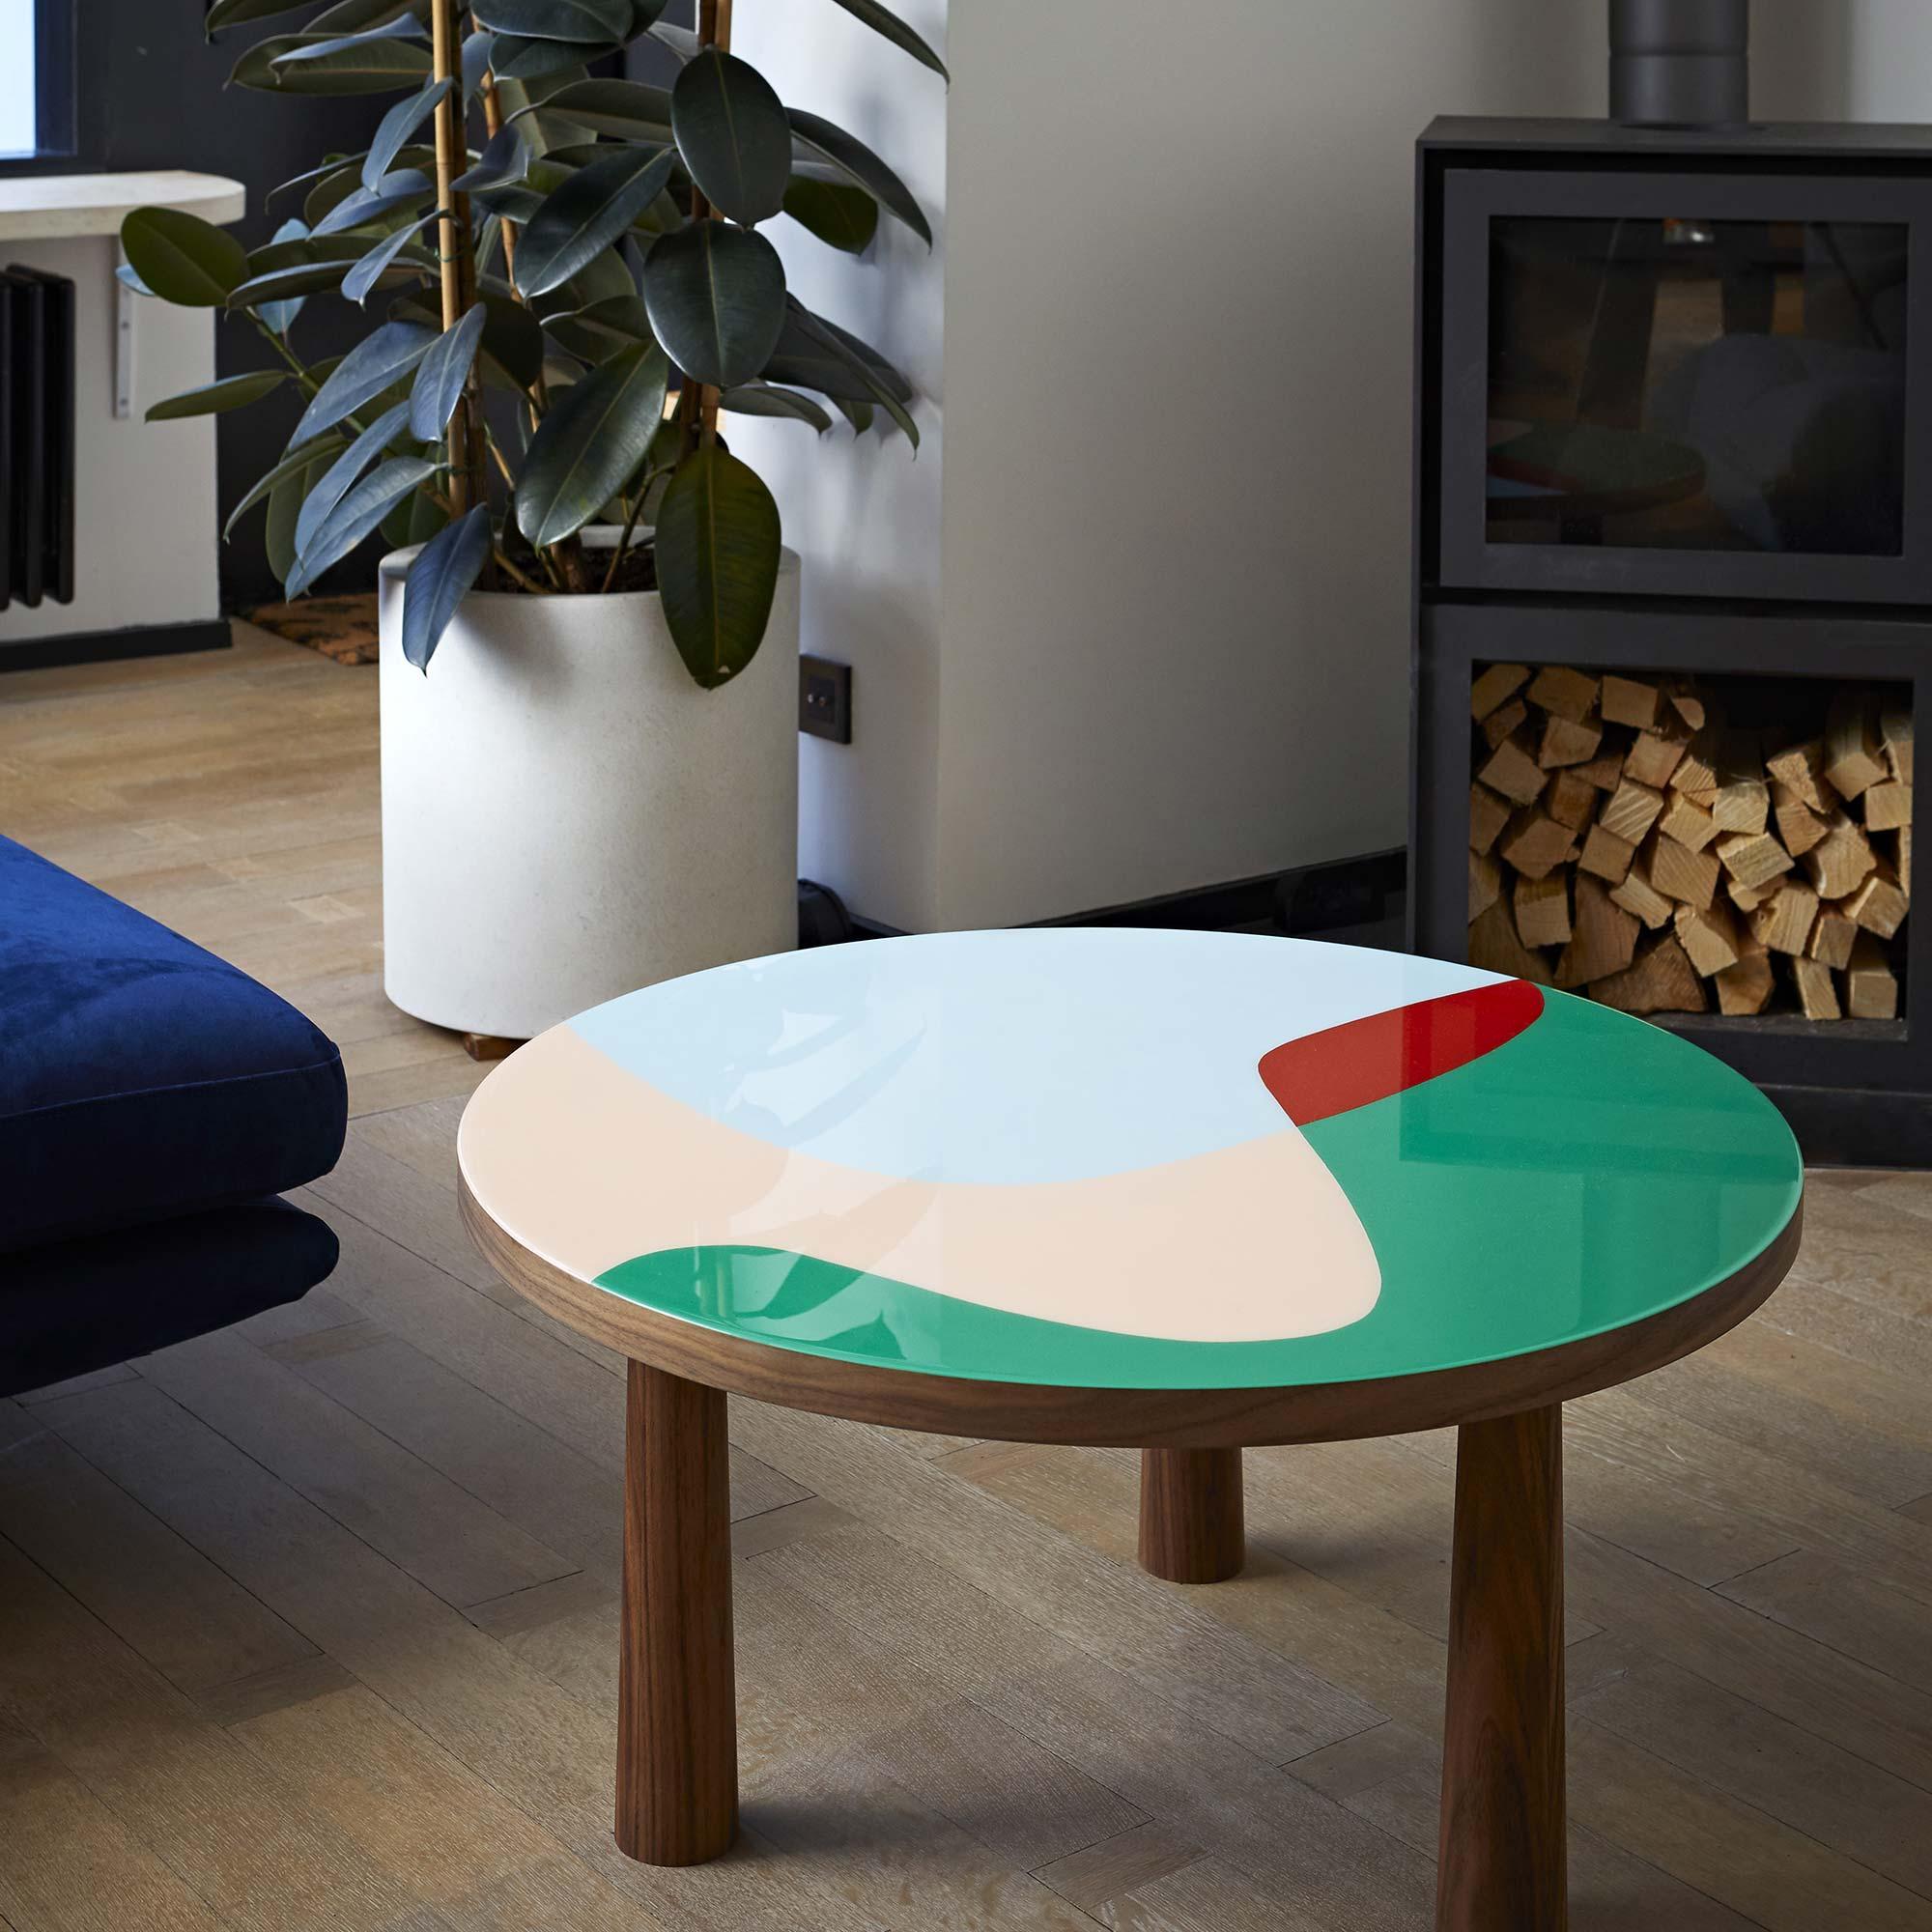 Alice Roux Décoratrice Designer Table Basse Tinoclo